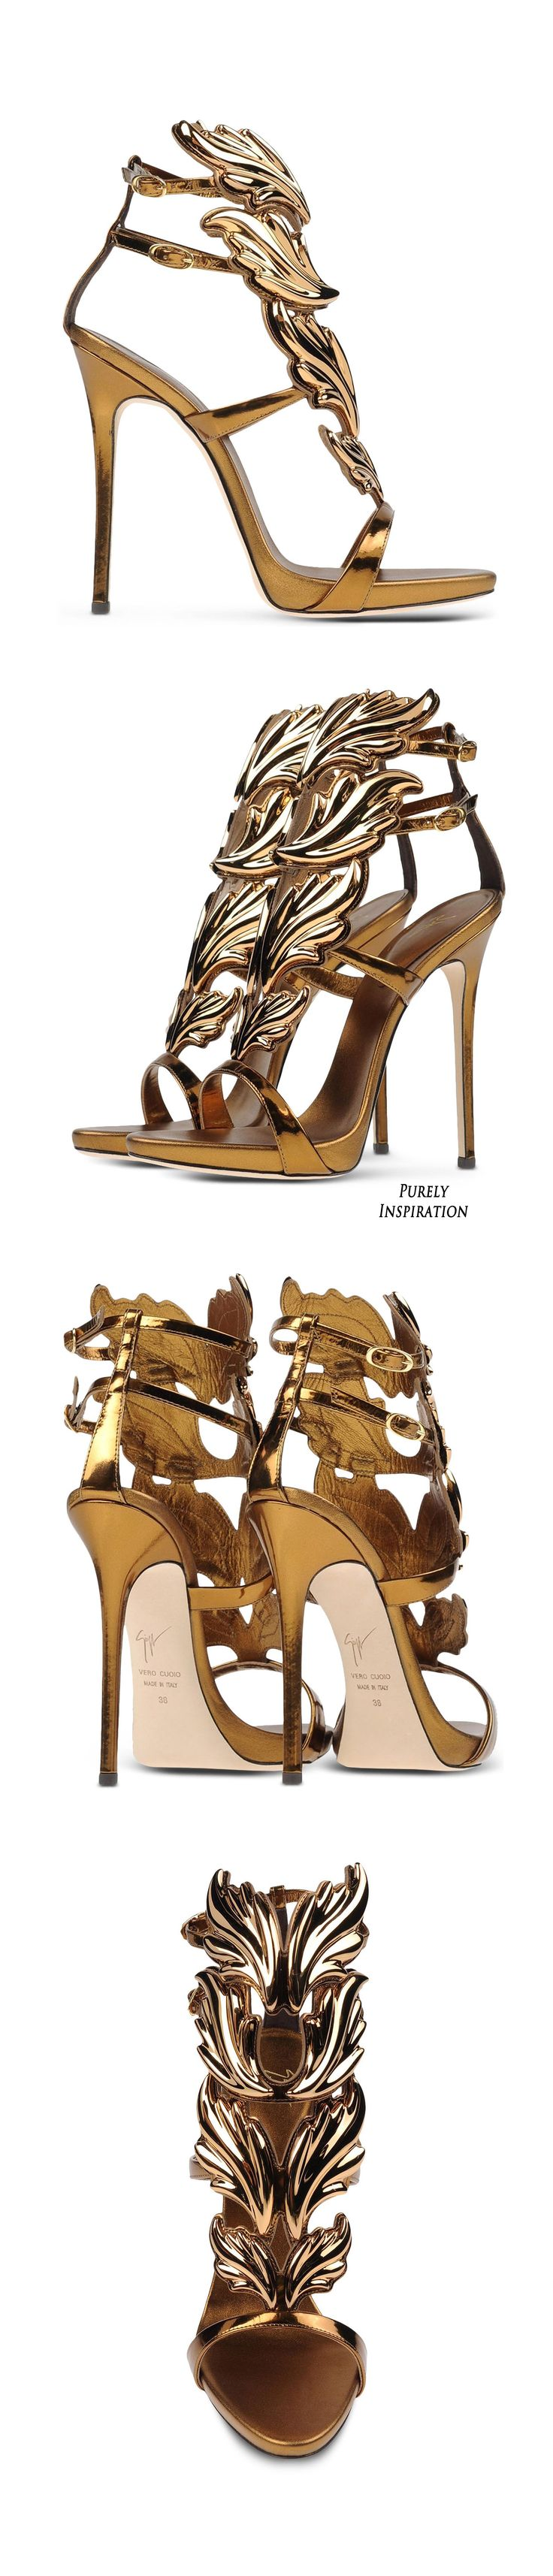 Giuseppe Zanotti Sandals | Purely Inspiration